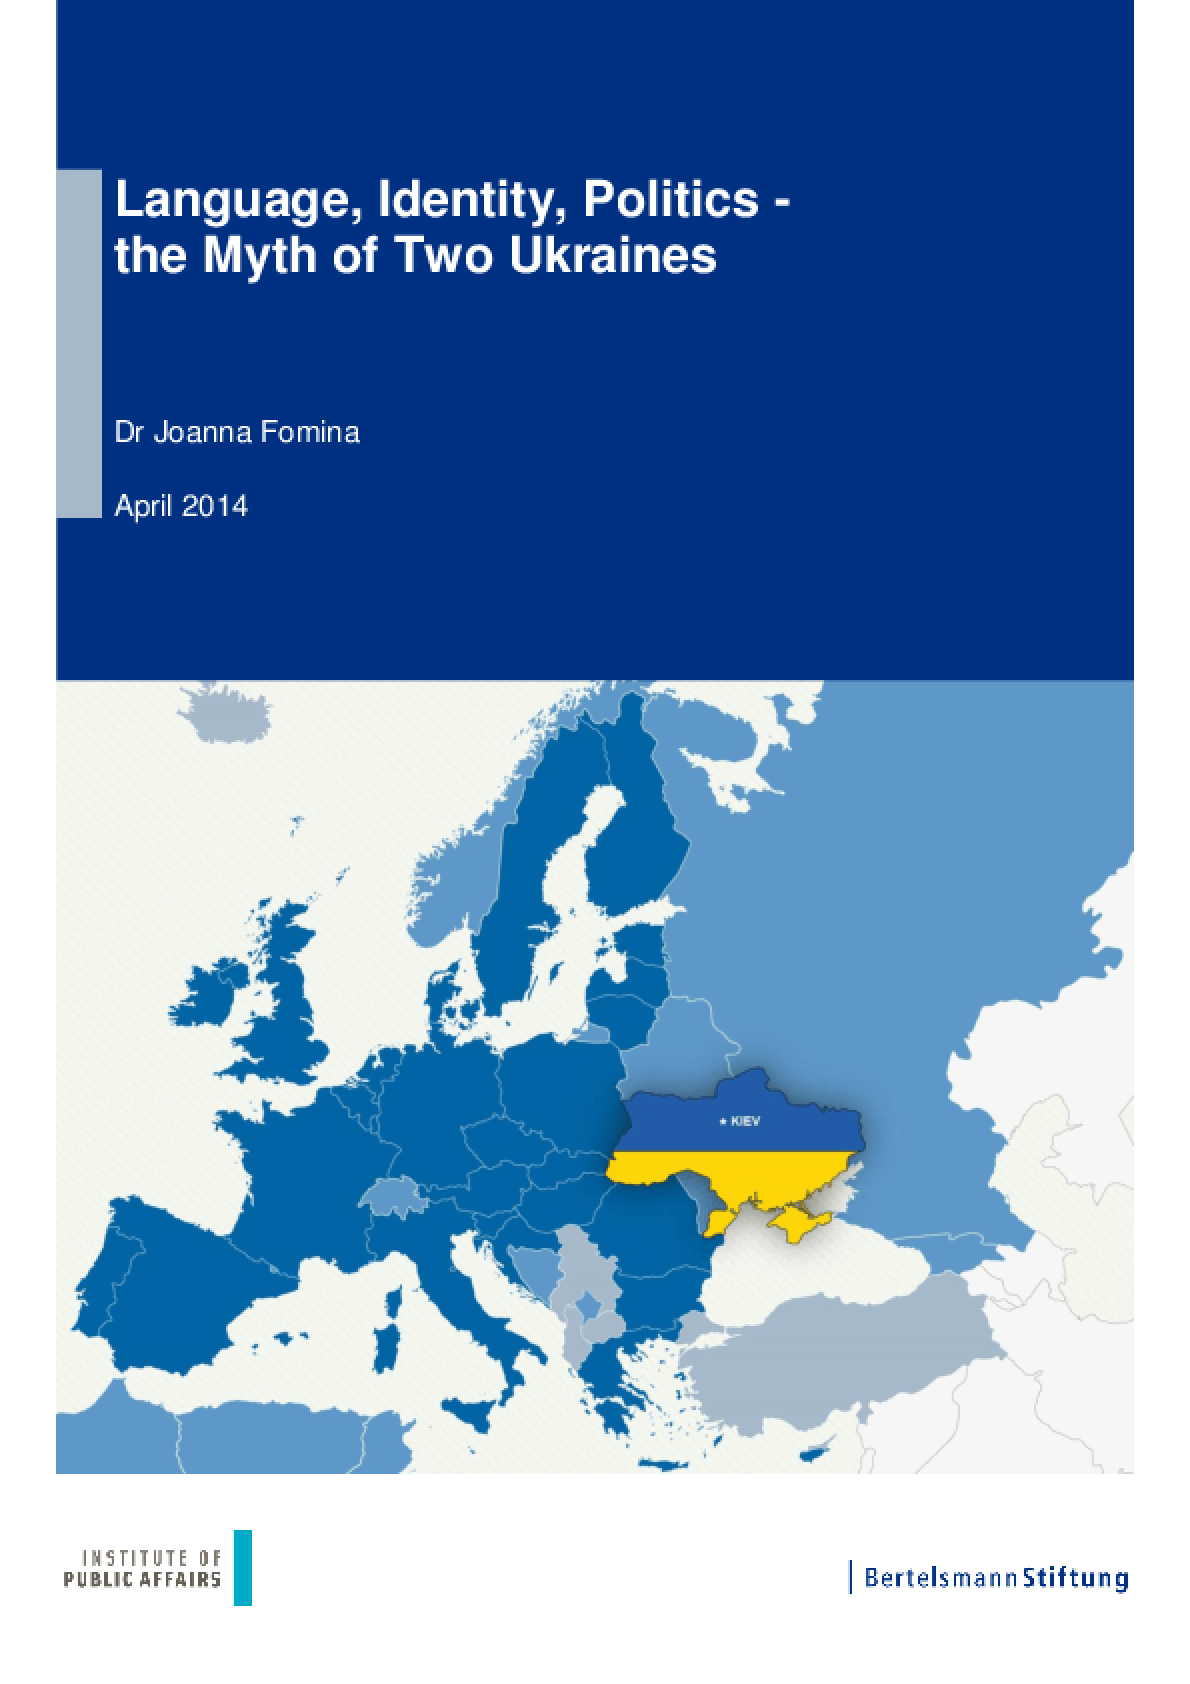 Language, Identity, Politics - the Myth of Two Ukraines